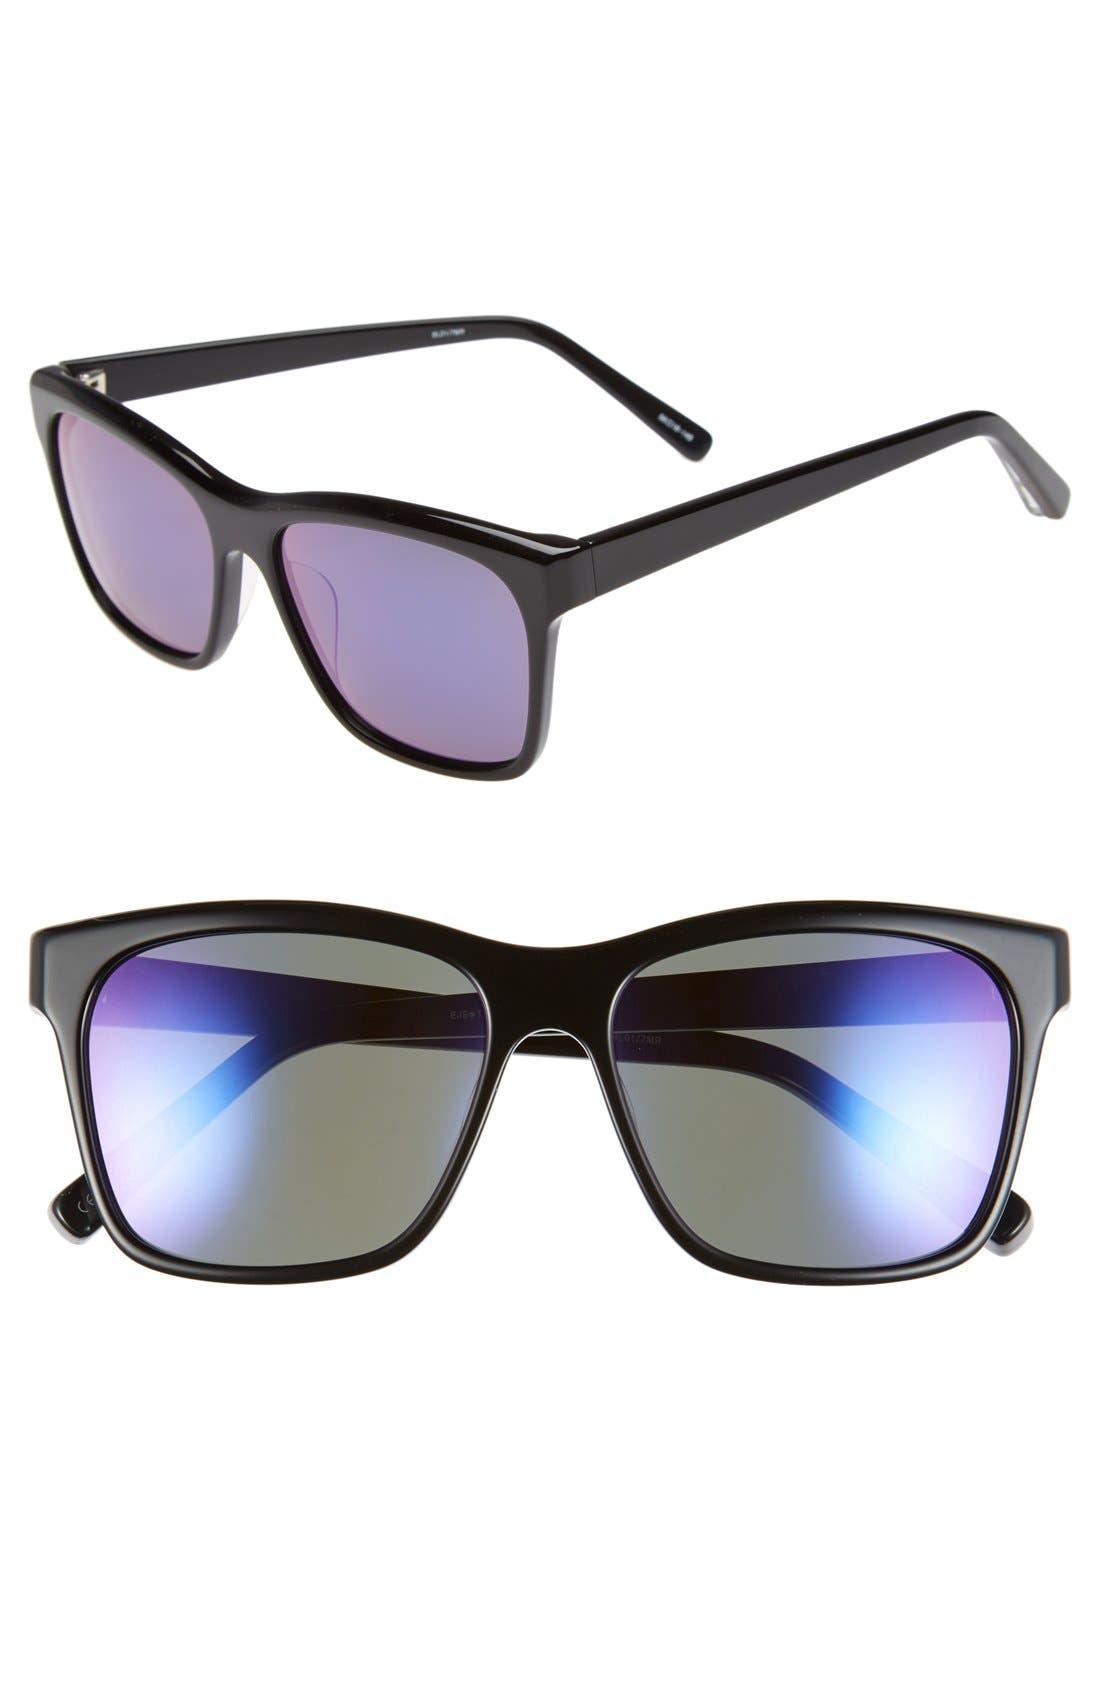 Alternate Image 1 Selected - Elizabeth and James 'Park' 56mm Sunglasses